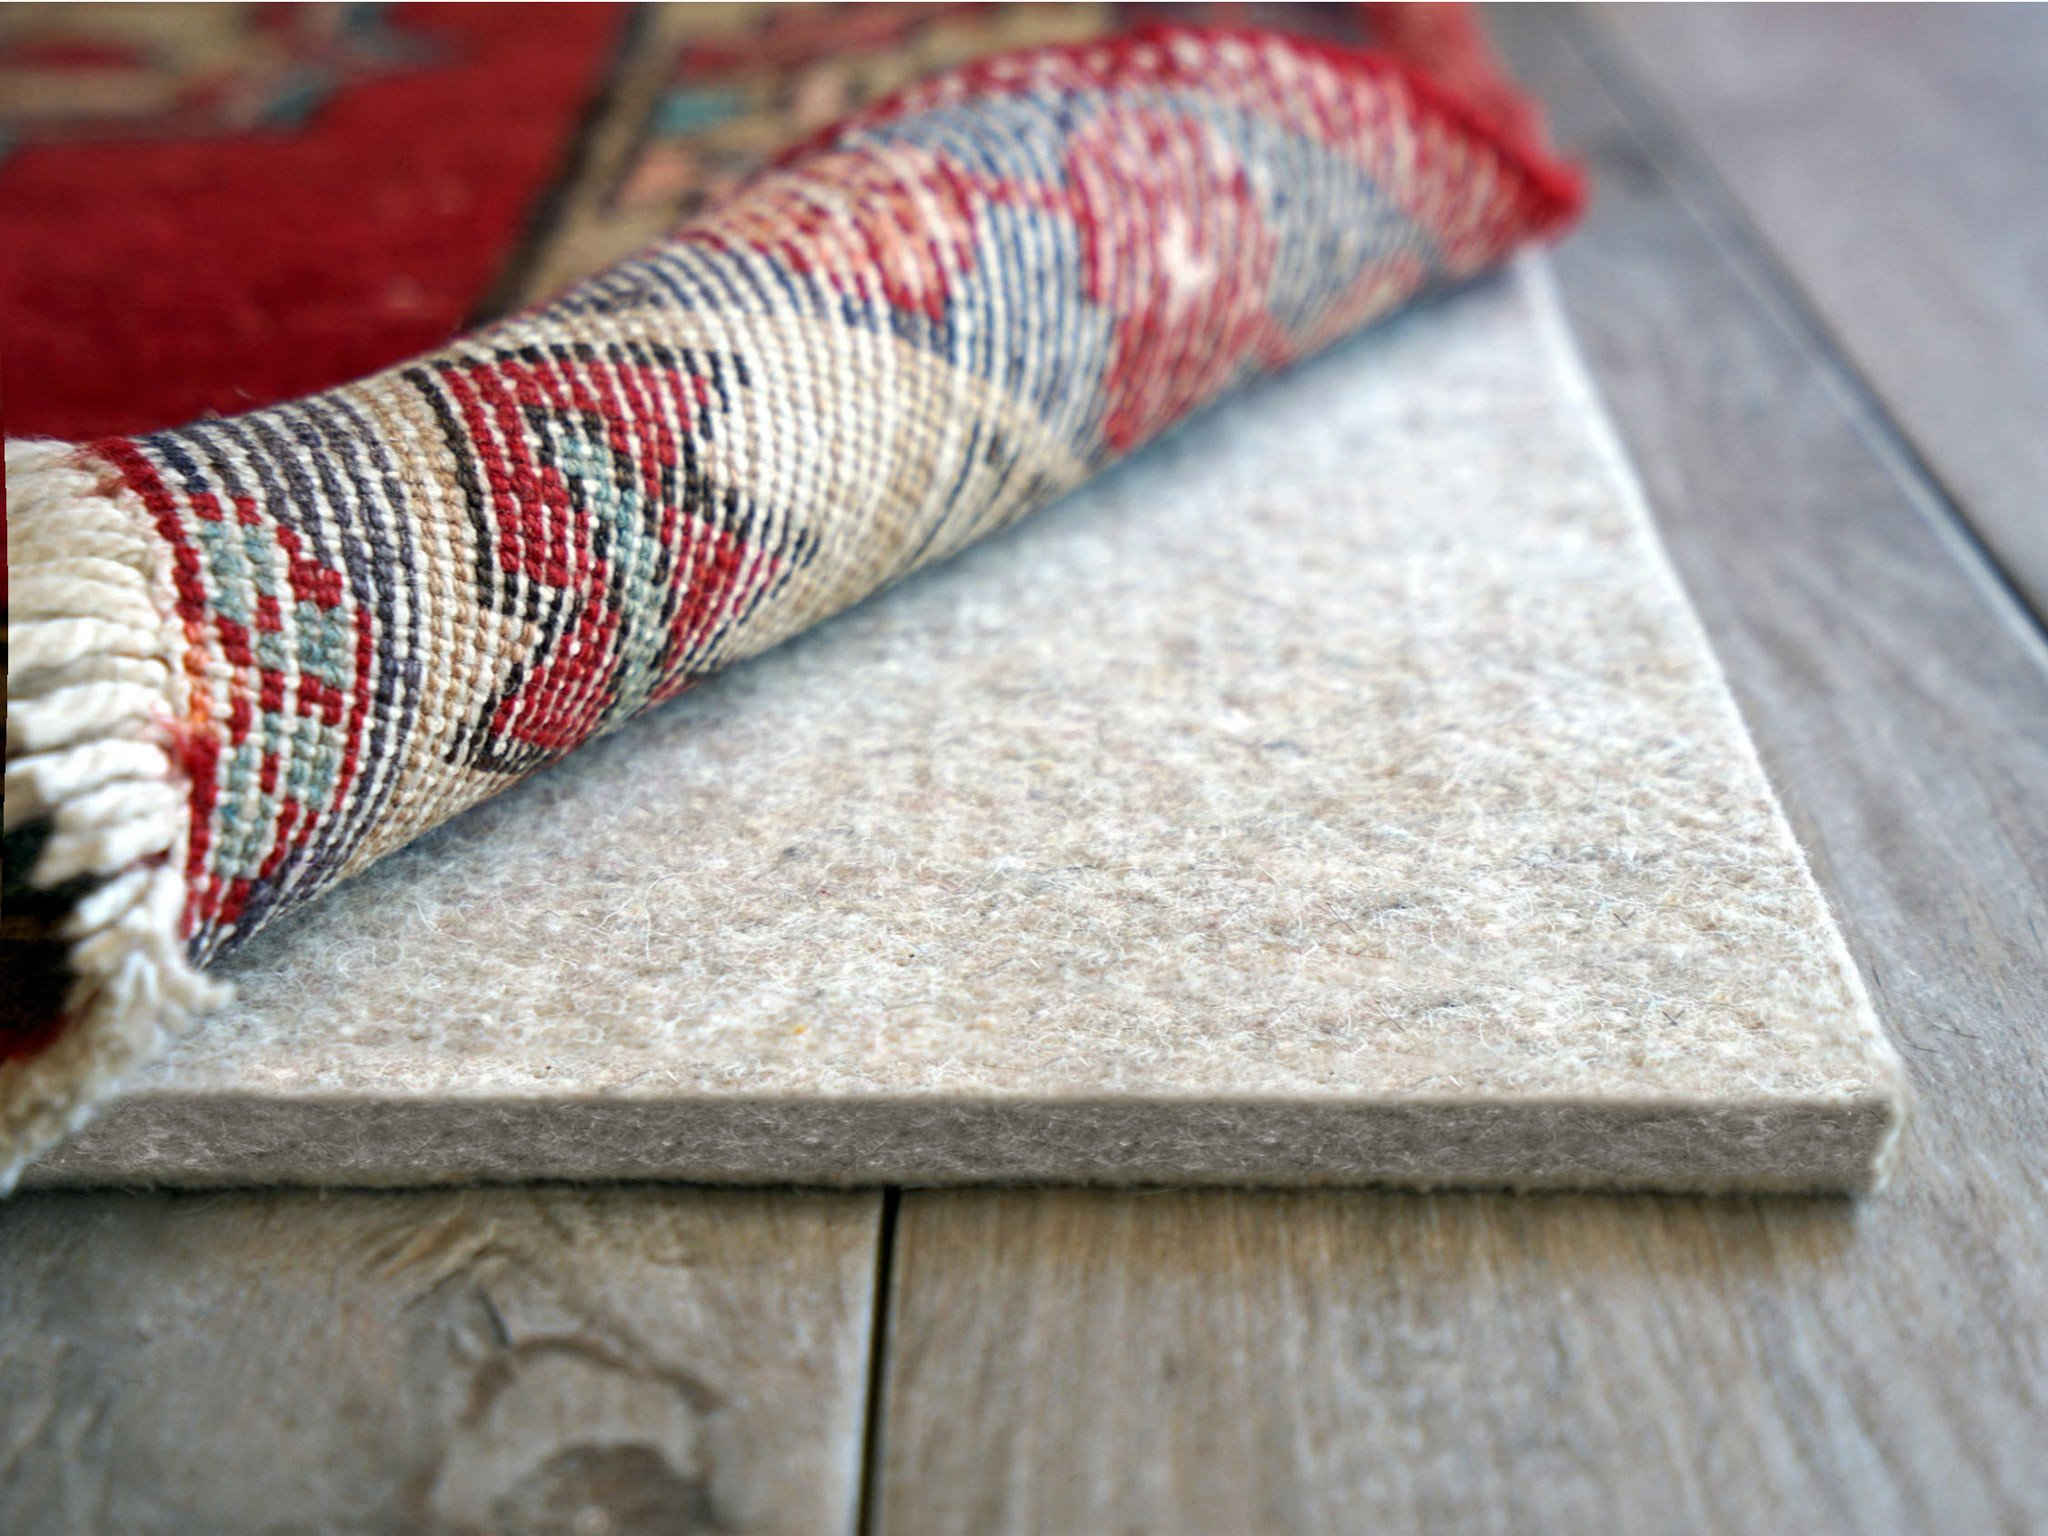 Eco Plush 3 8 Sound Proofing Carpet Padding Textured Carpet